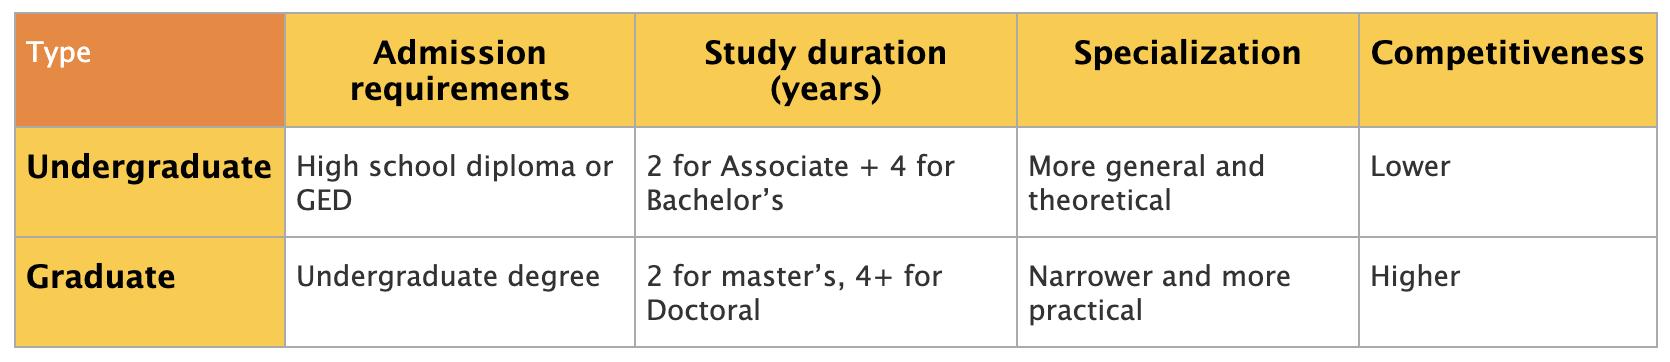 Undergraduate vs. Graduate